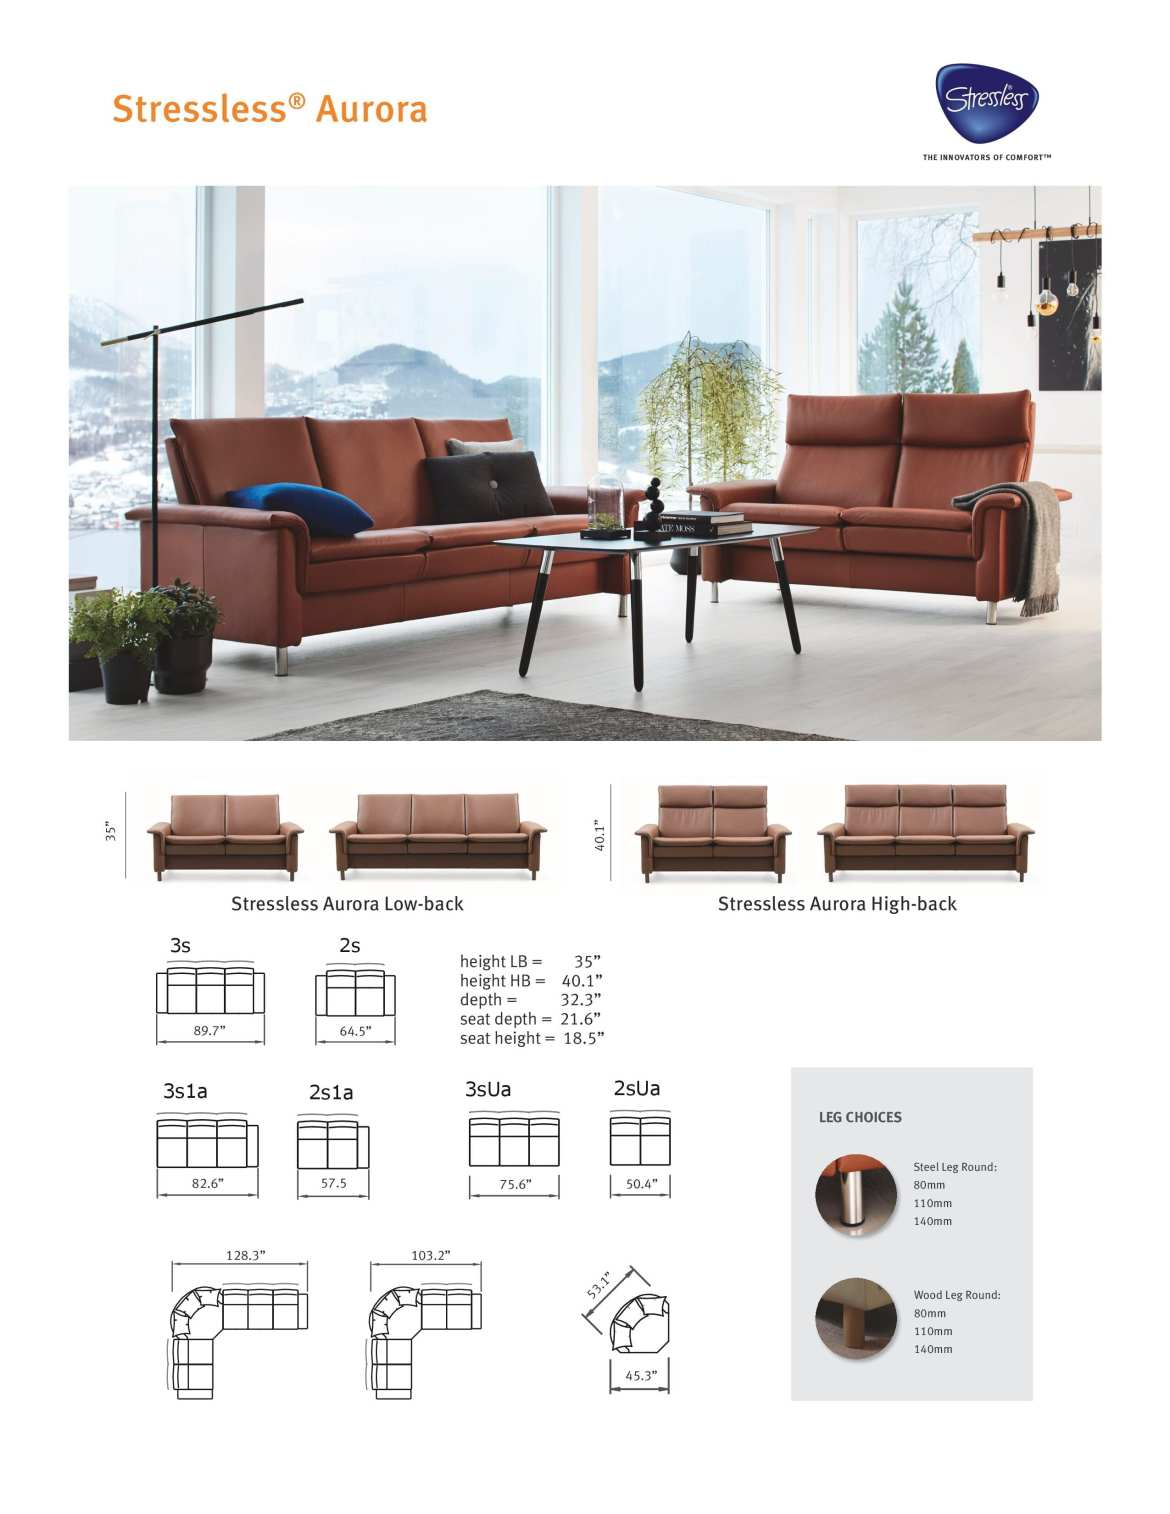 Aurora Stressless Sofa Product Sheet